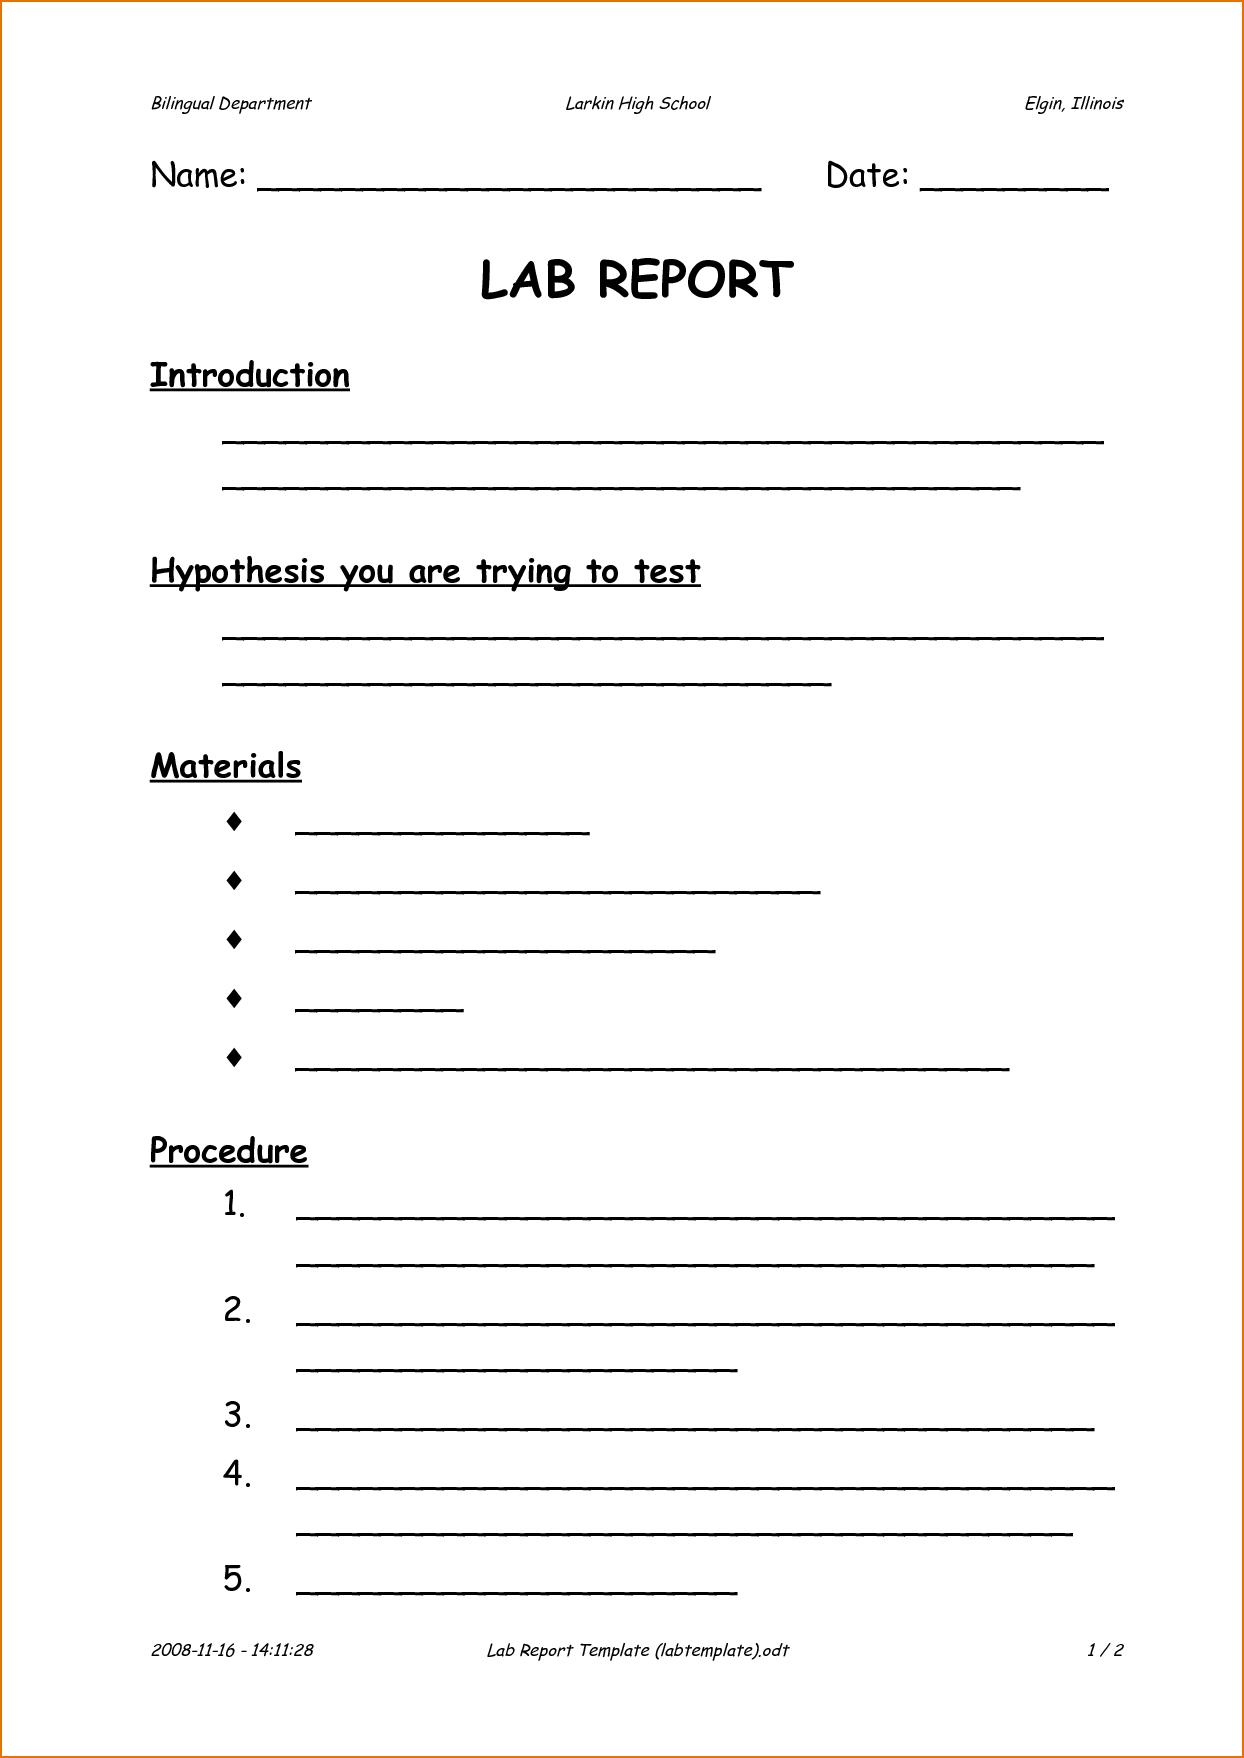 314.802.2000 clayton, missouri 63105 fax: Iso 9001 Internal Audit Template Shotslasopa